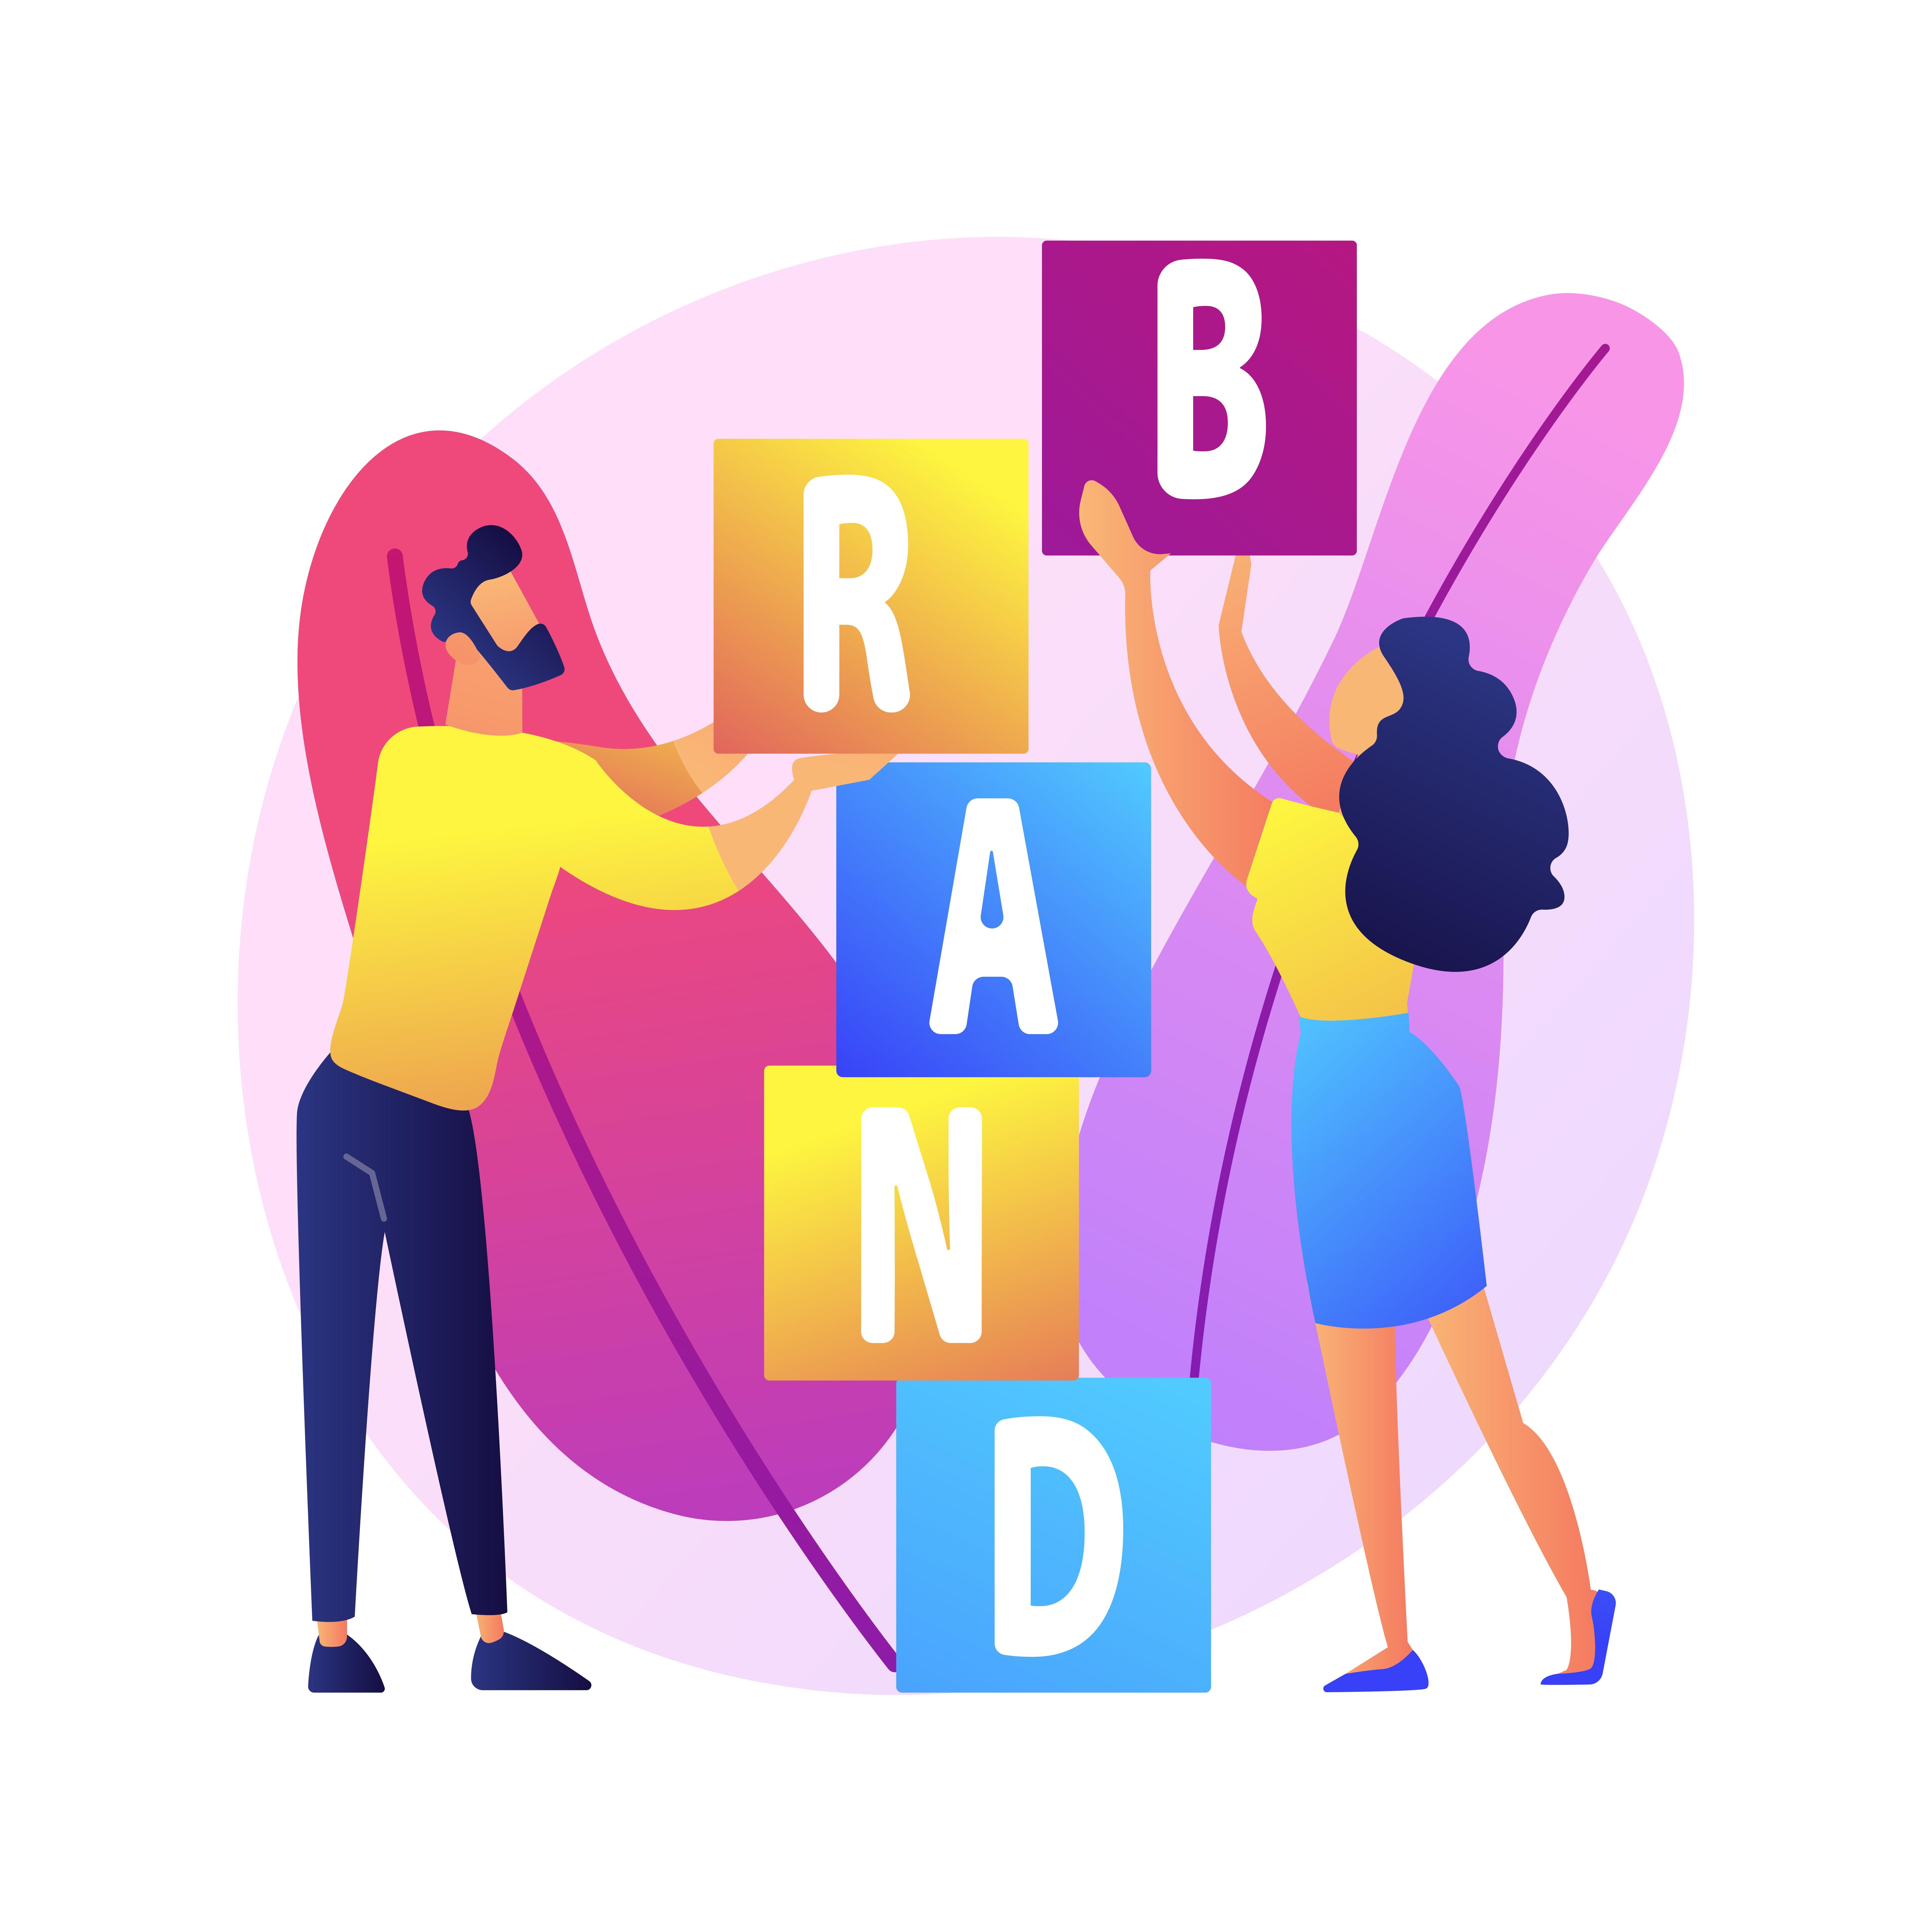 iSmart Communication Brand Loyalty